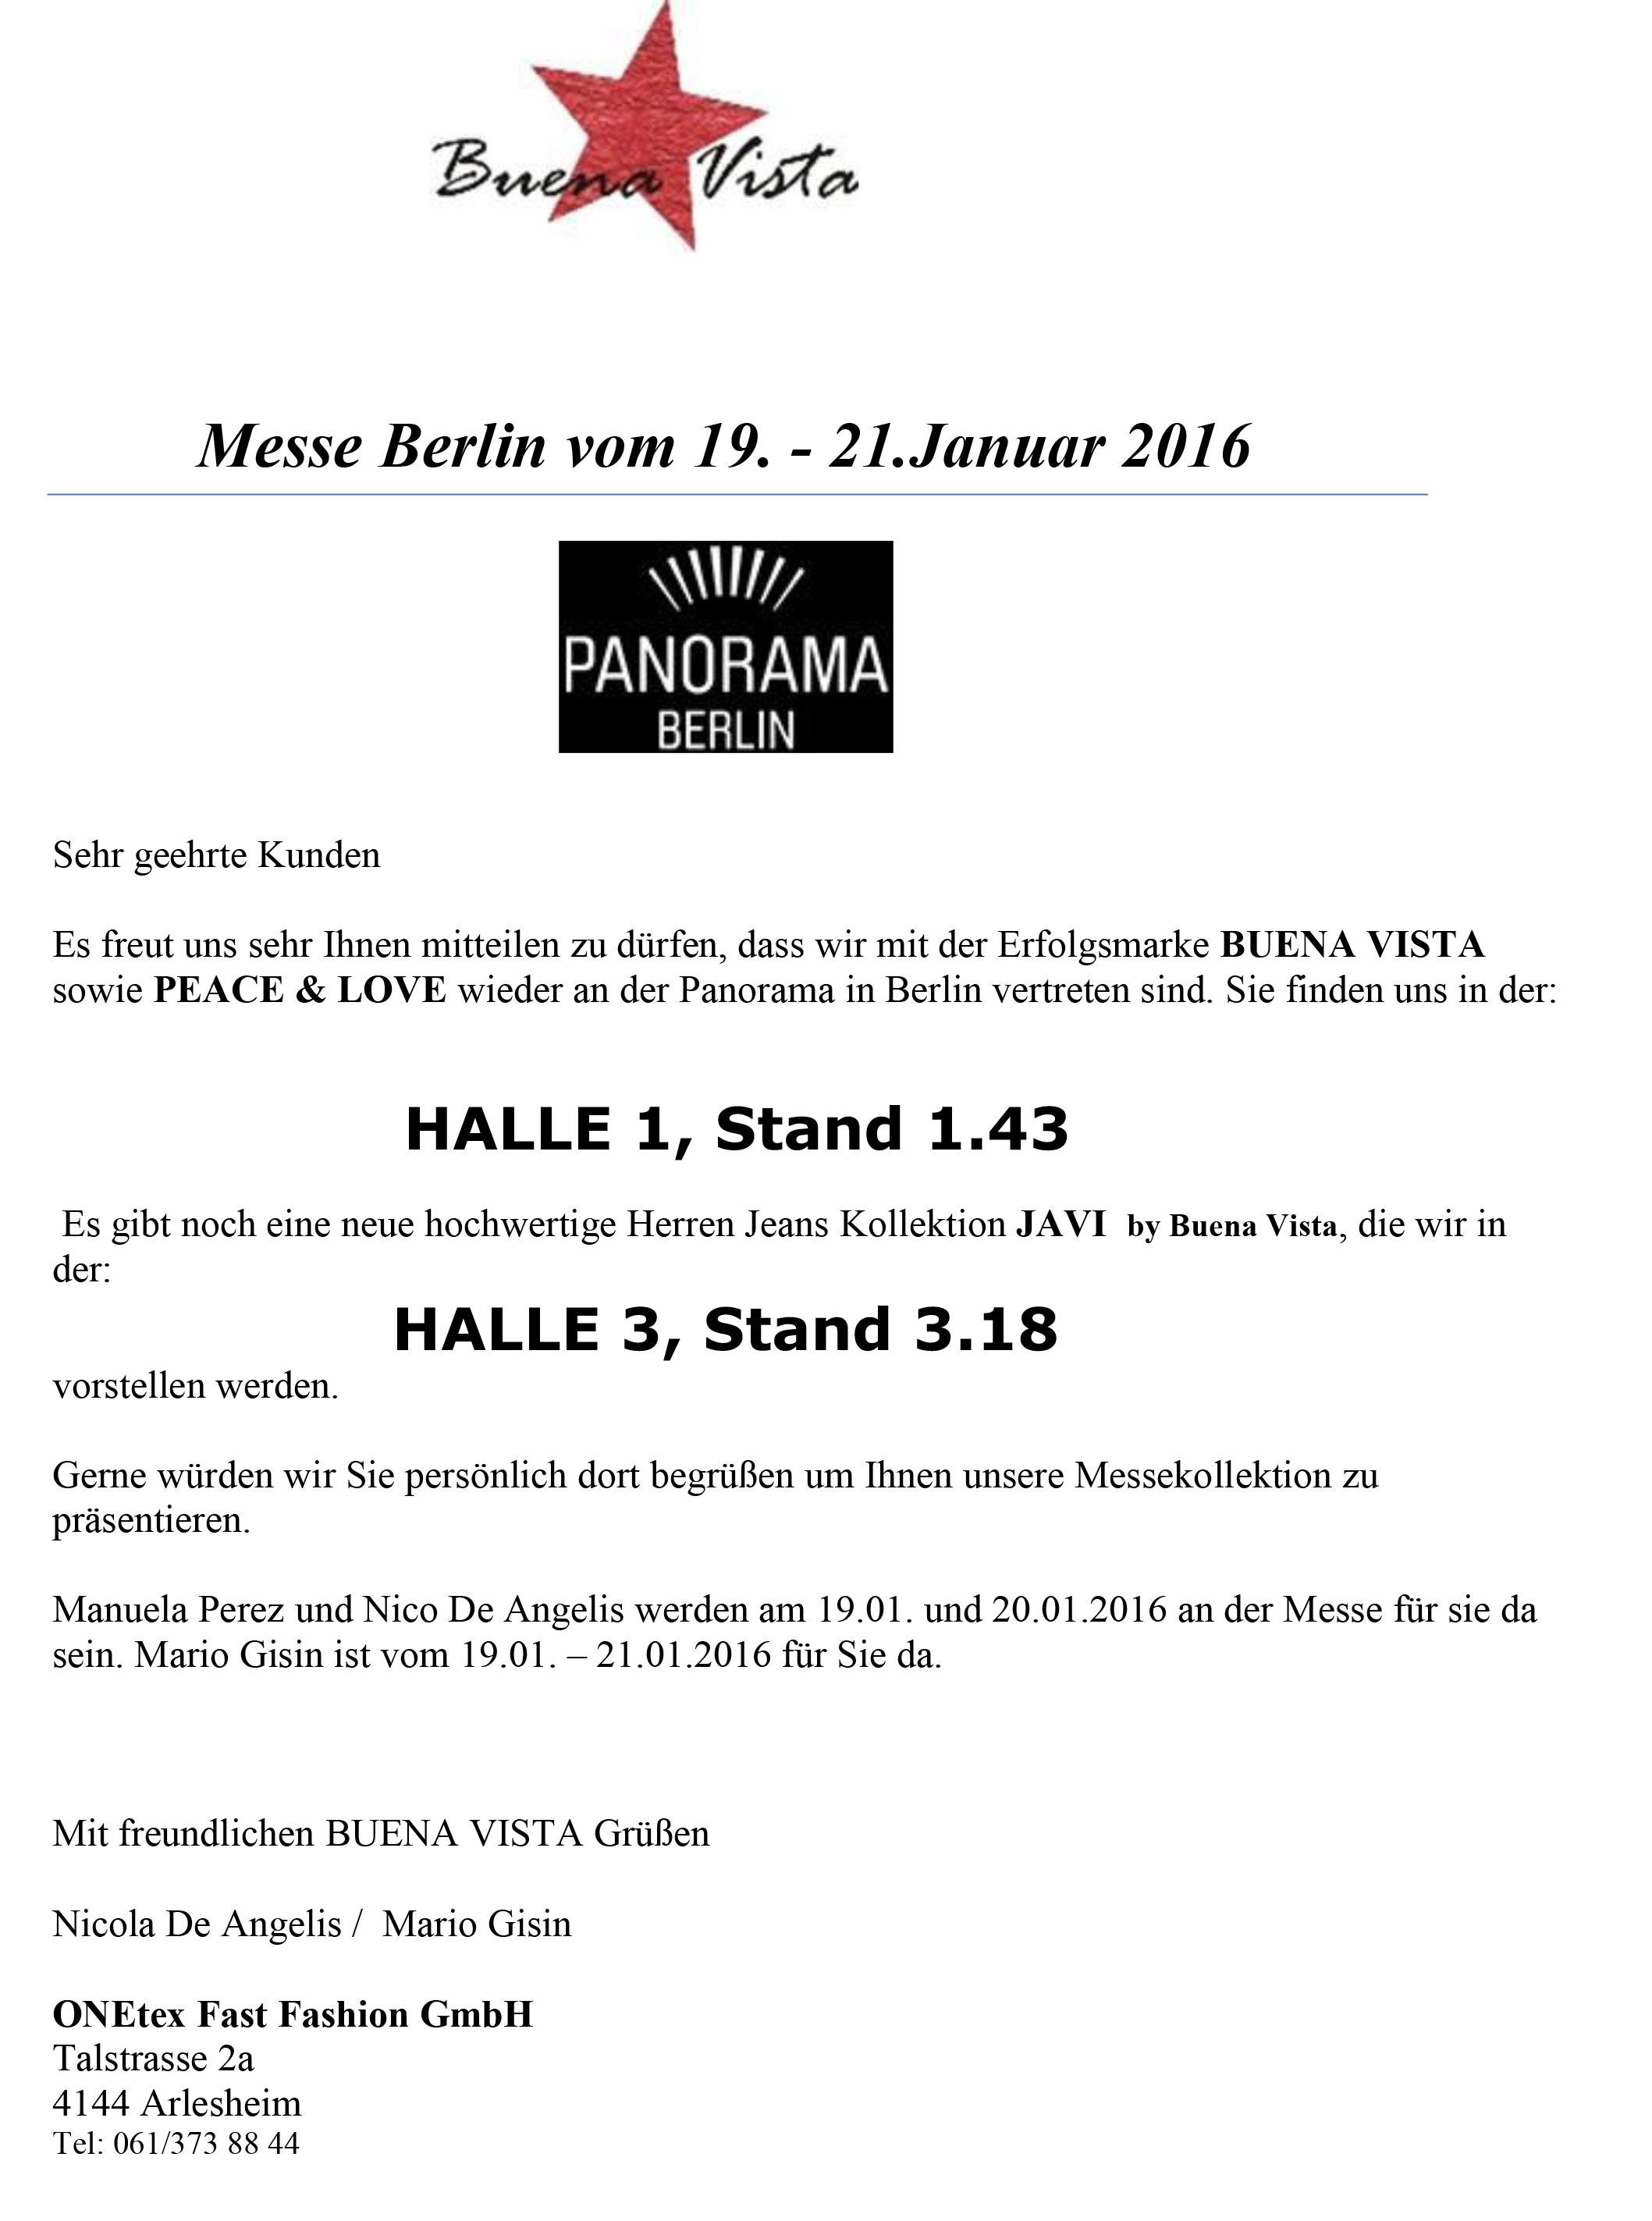 einladung: messe panorama berlin vom 19. – 21. januar 2016 – onetex, Einladung